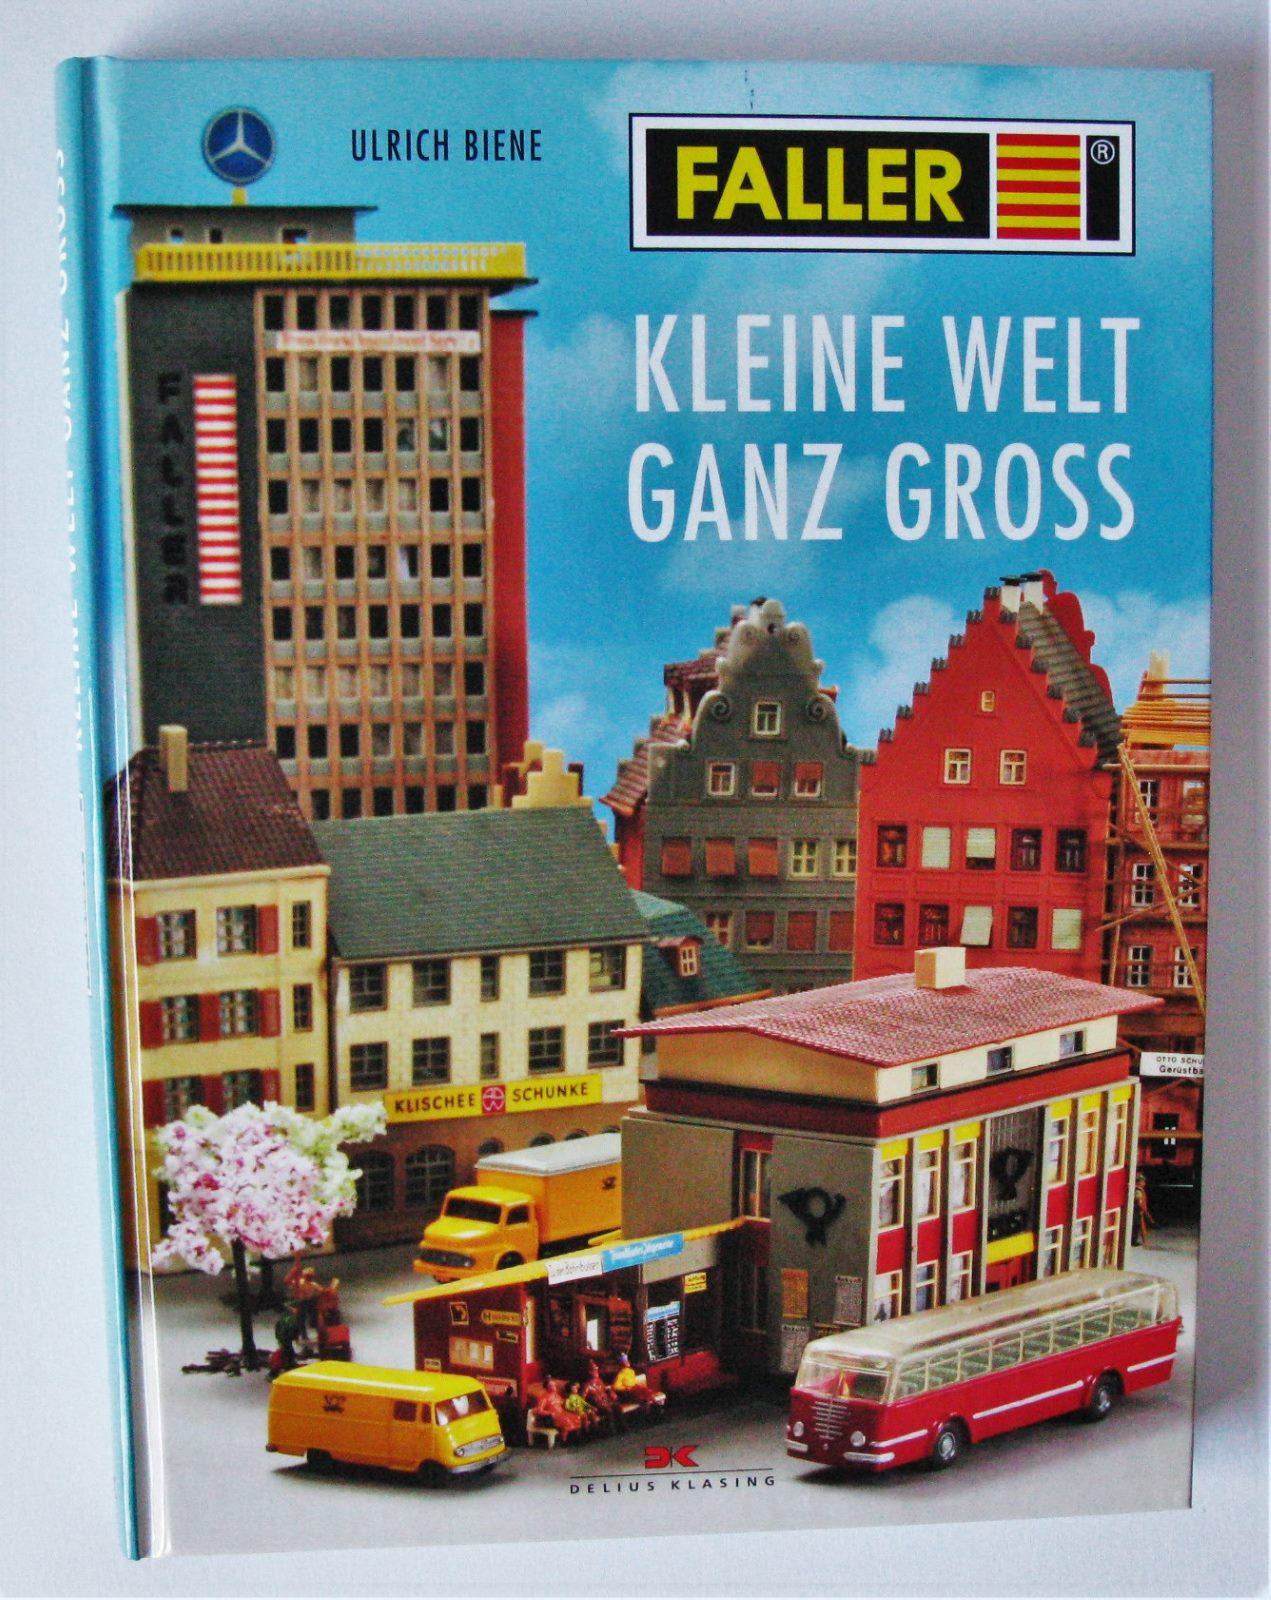 Faller 190900 FALLER Buch  Kleine Welt ganz groß